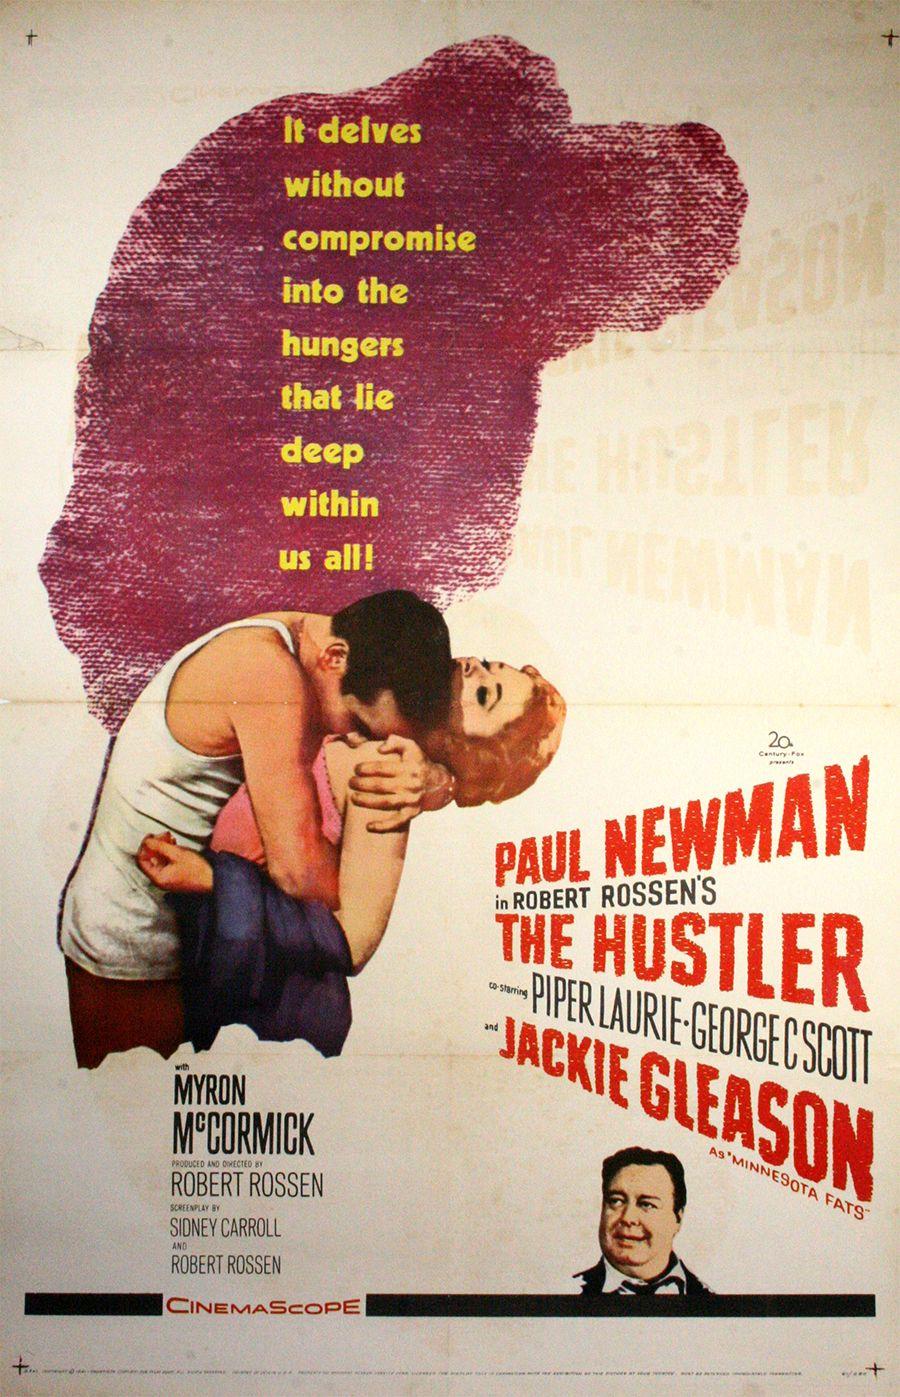 The movie poster for The Hustler